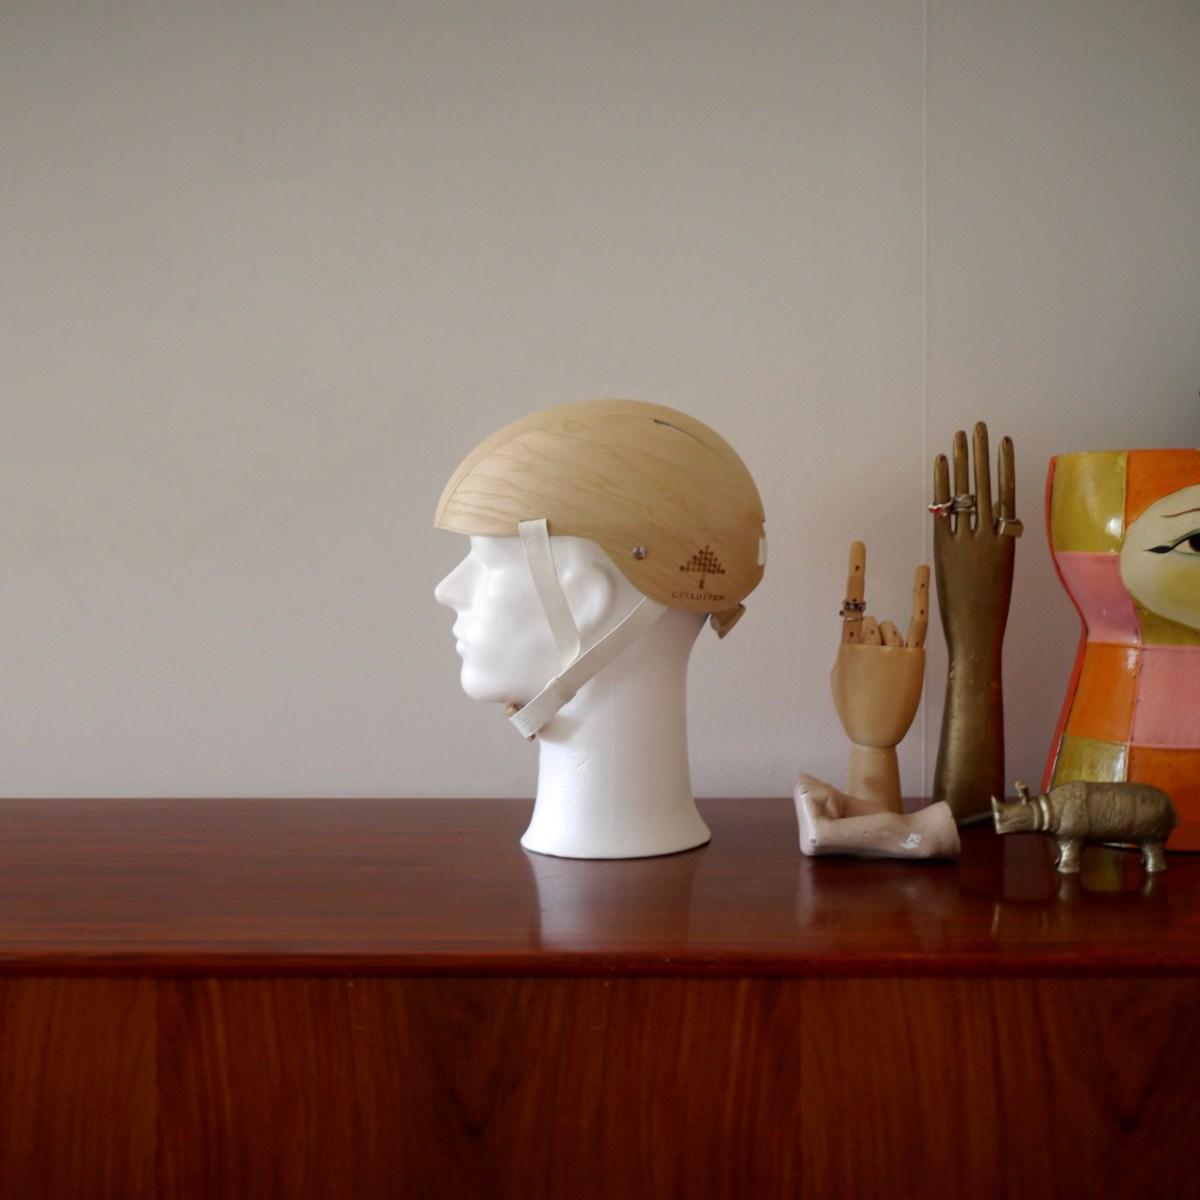 content_plain-magazine-wood-helmet05